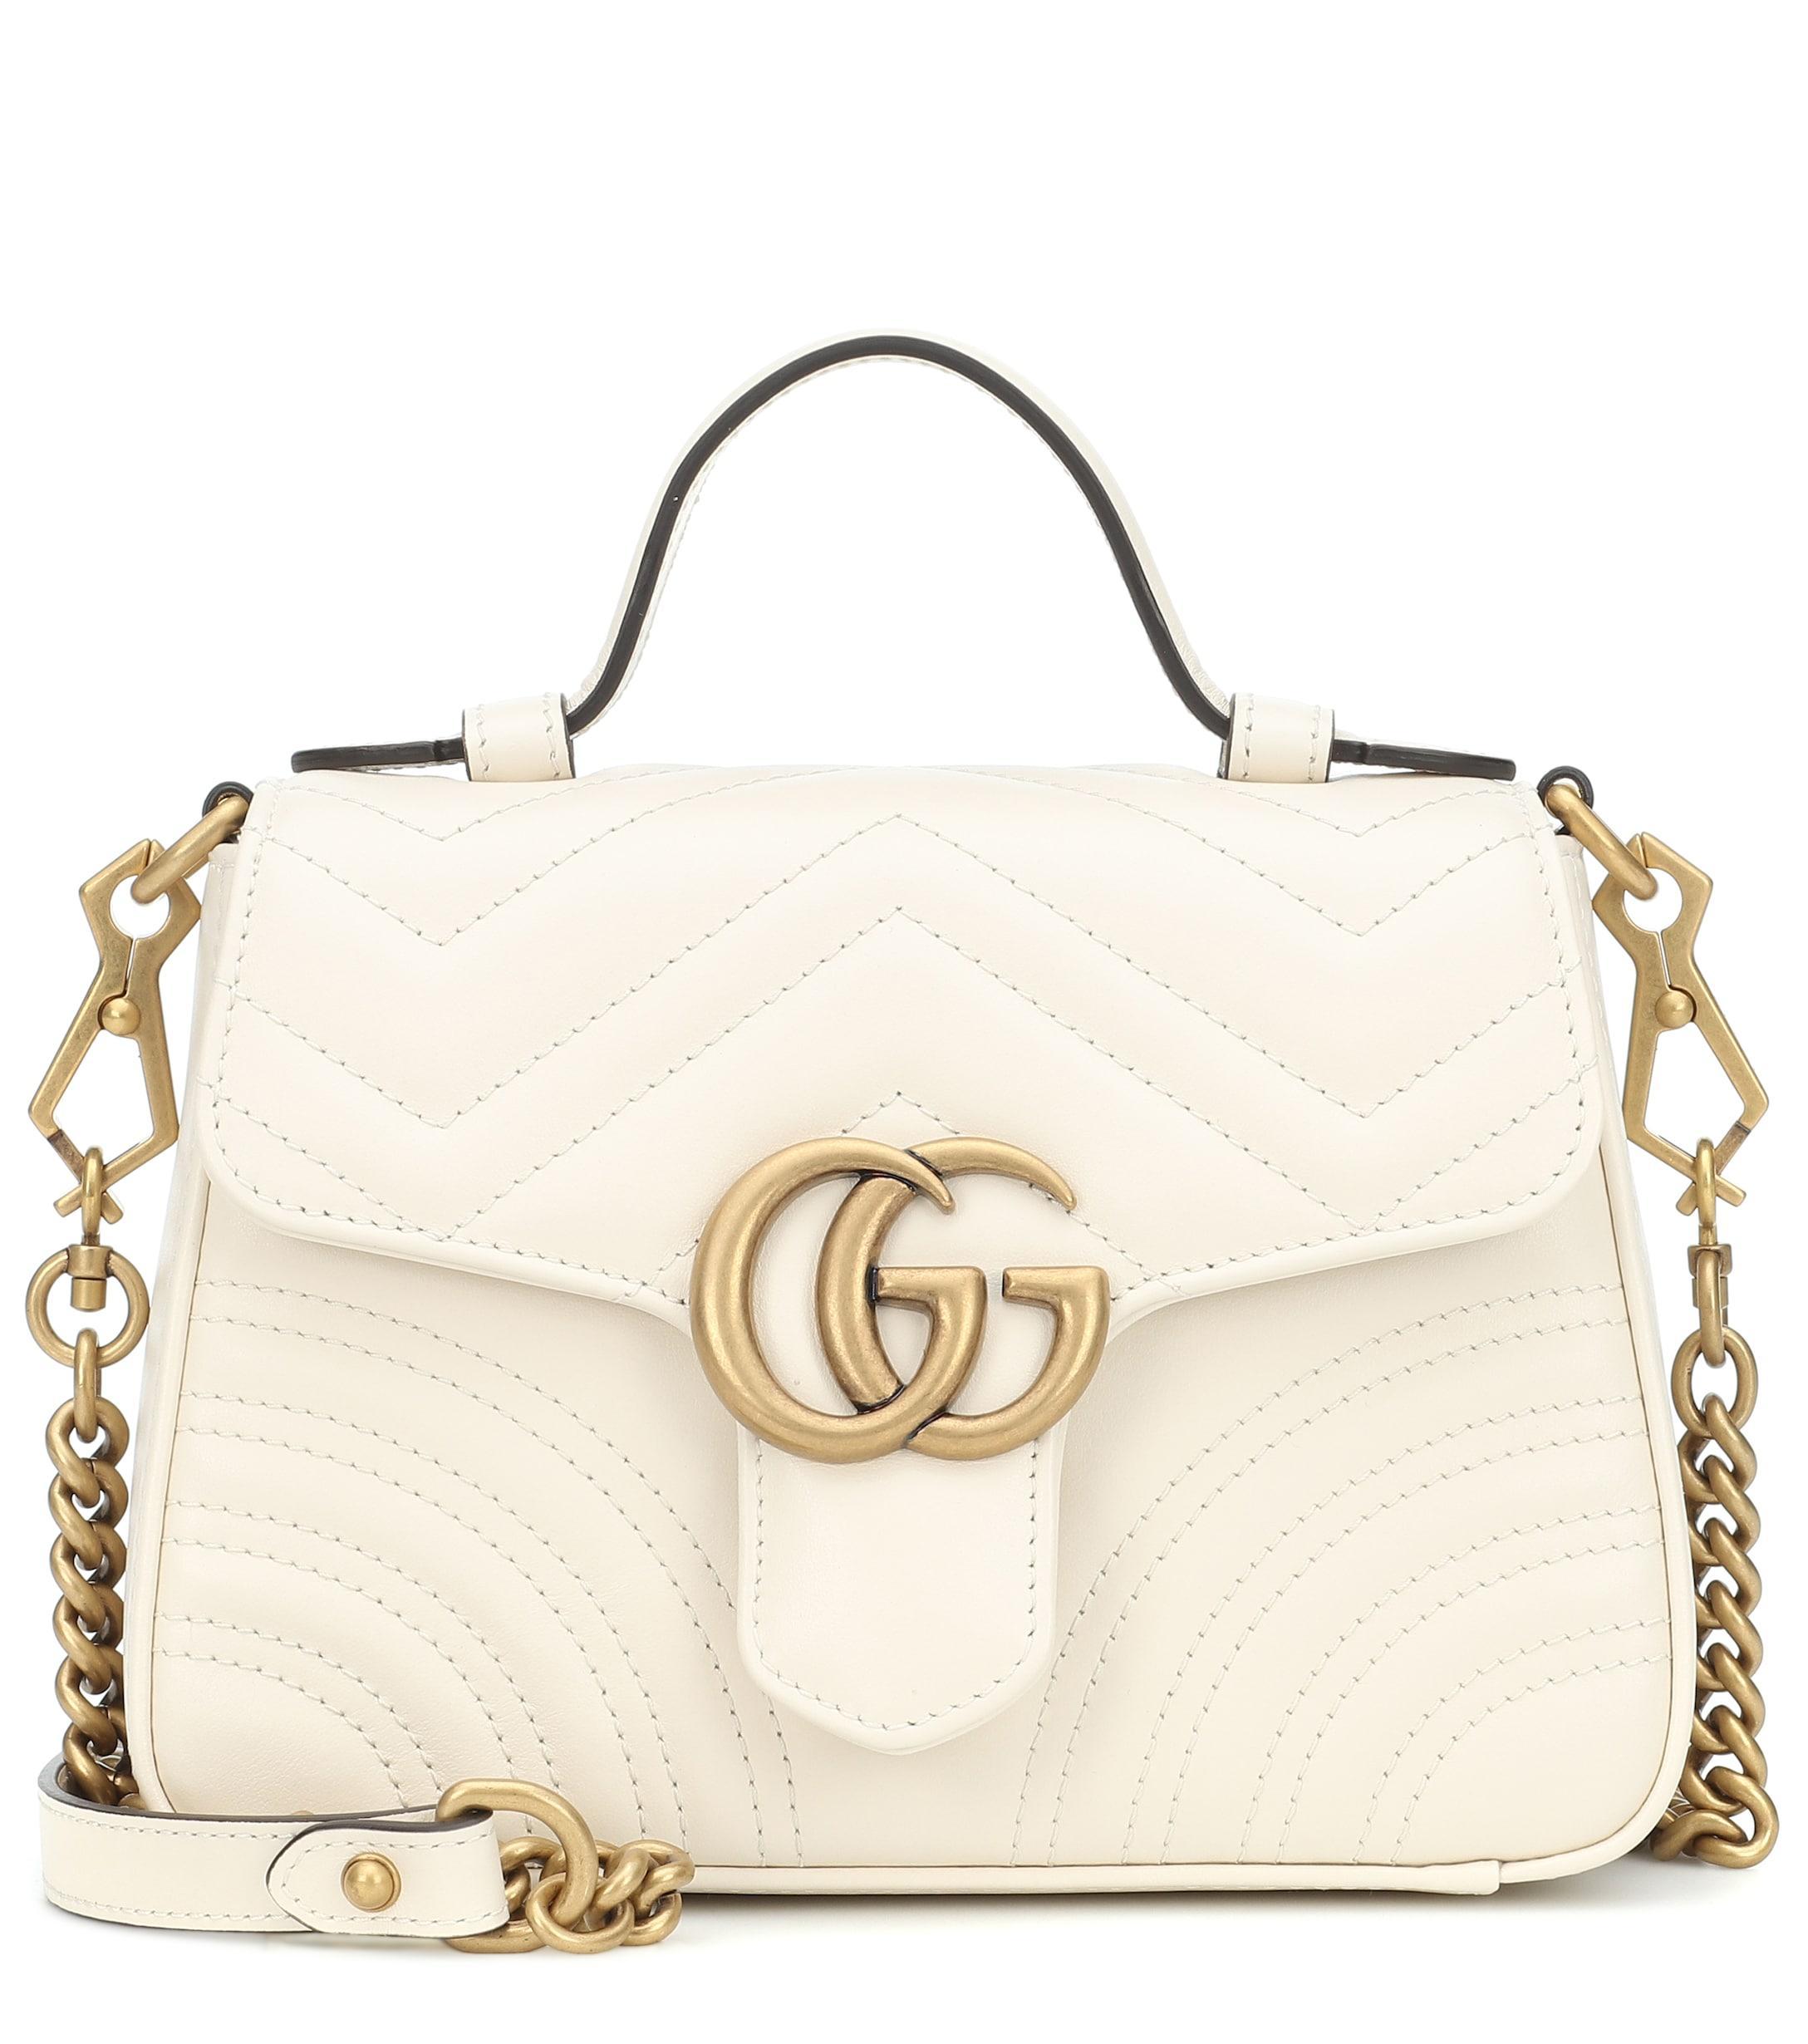 76cbed13832 Gucci GG Marmont Mini Shoulder Bag in White - Lyst